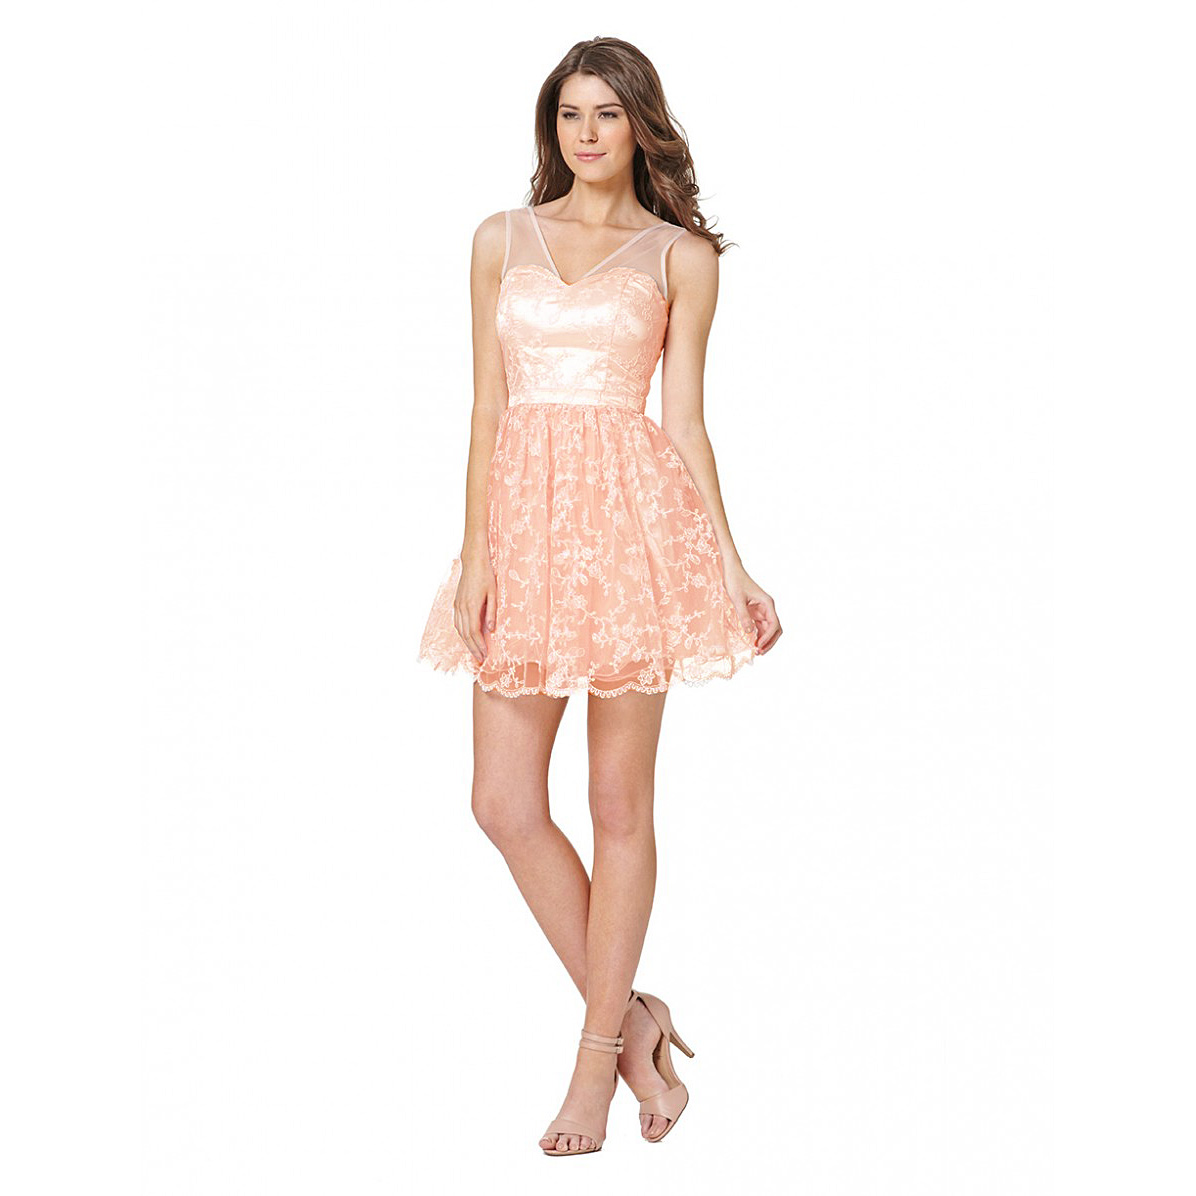 Cheap Prom Dresses Under 50 Pounds / Cheap Prom Dresses 2015